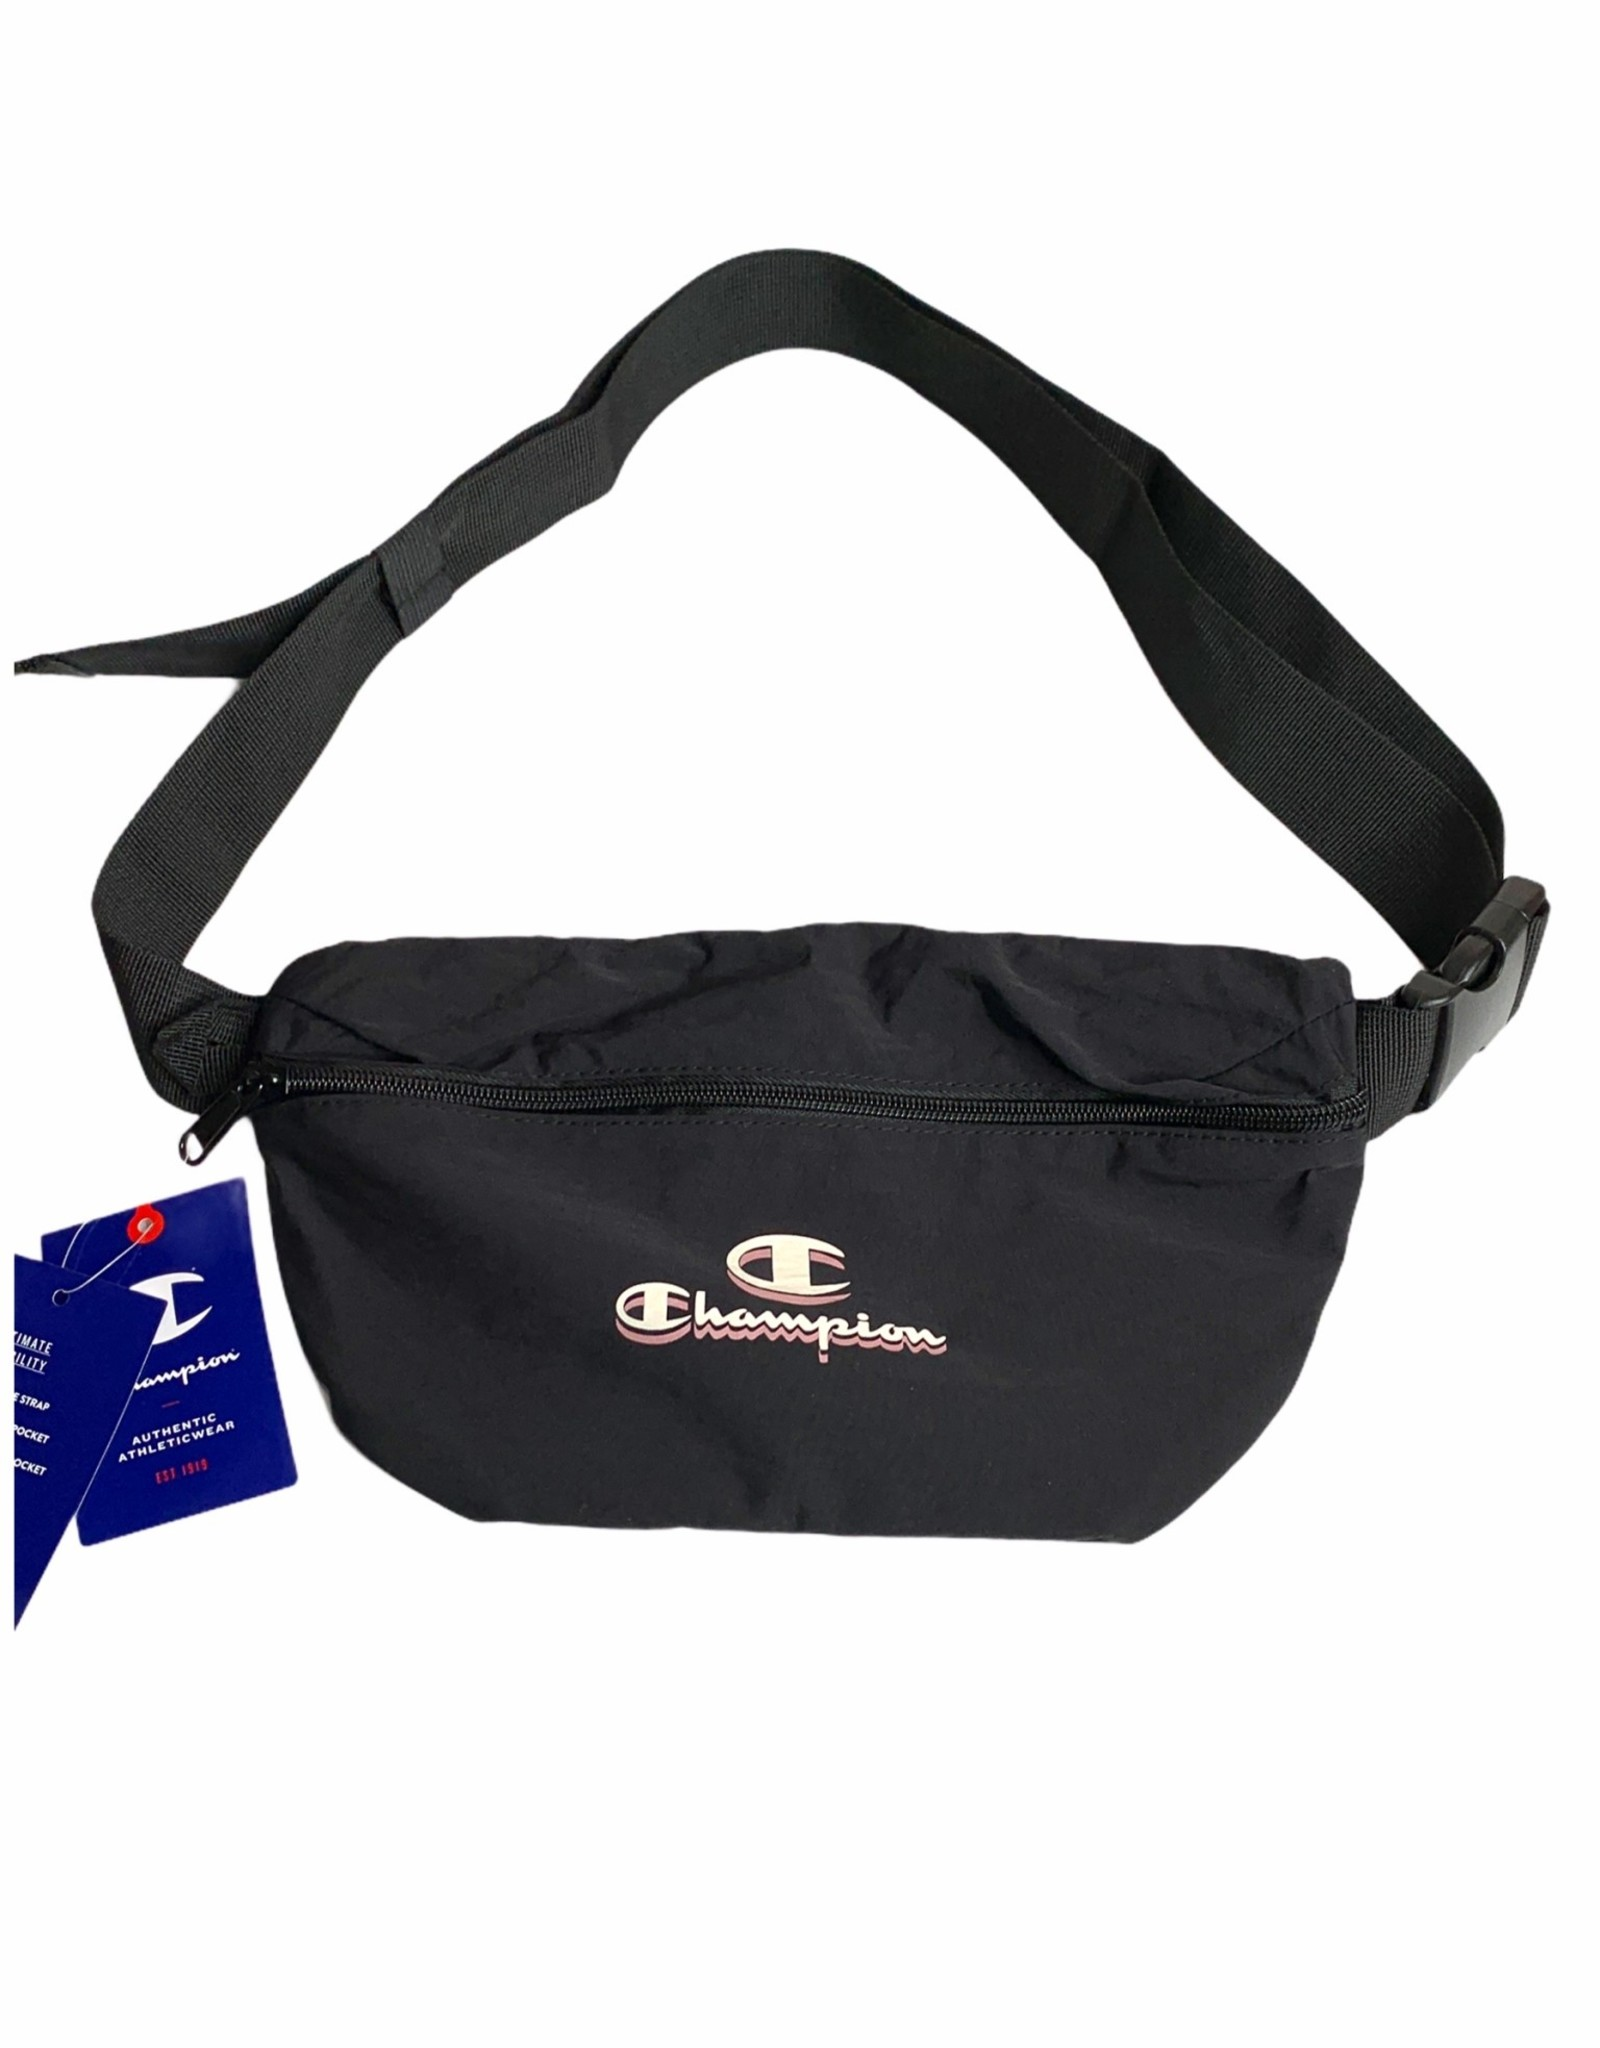 Champion Champion Belt Bag